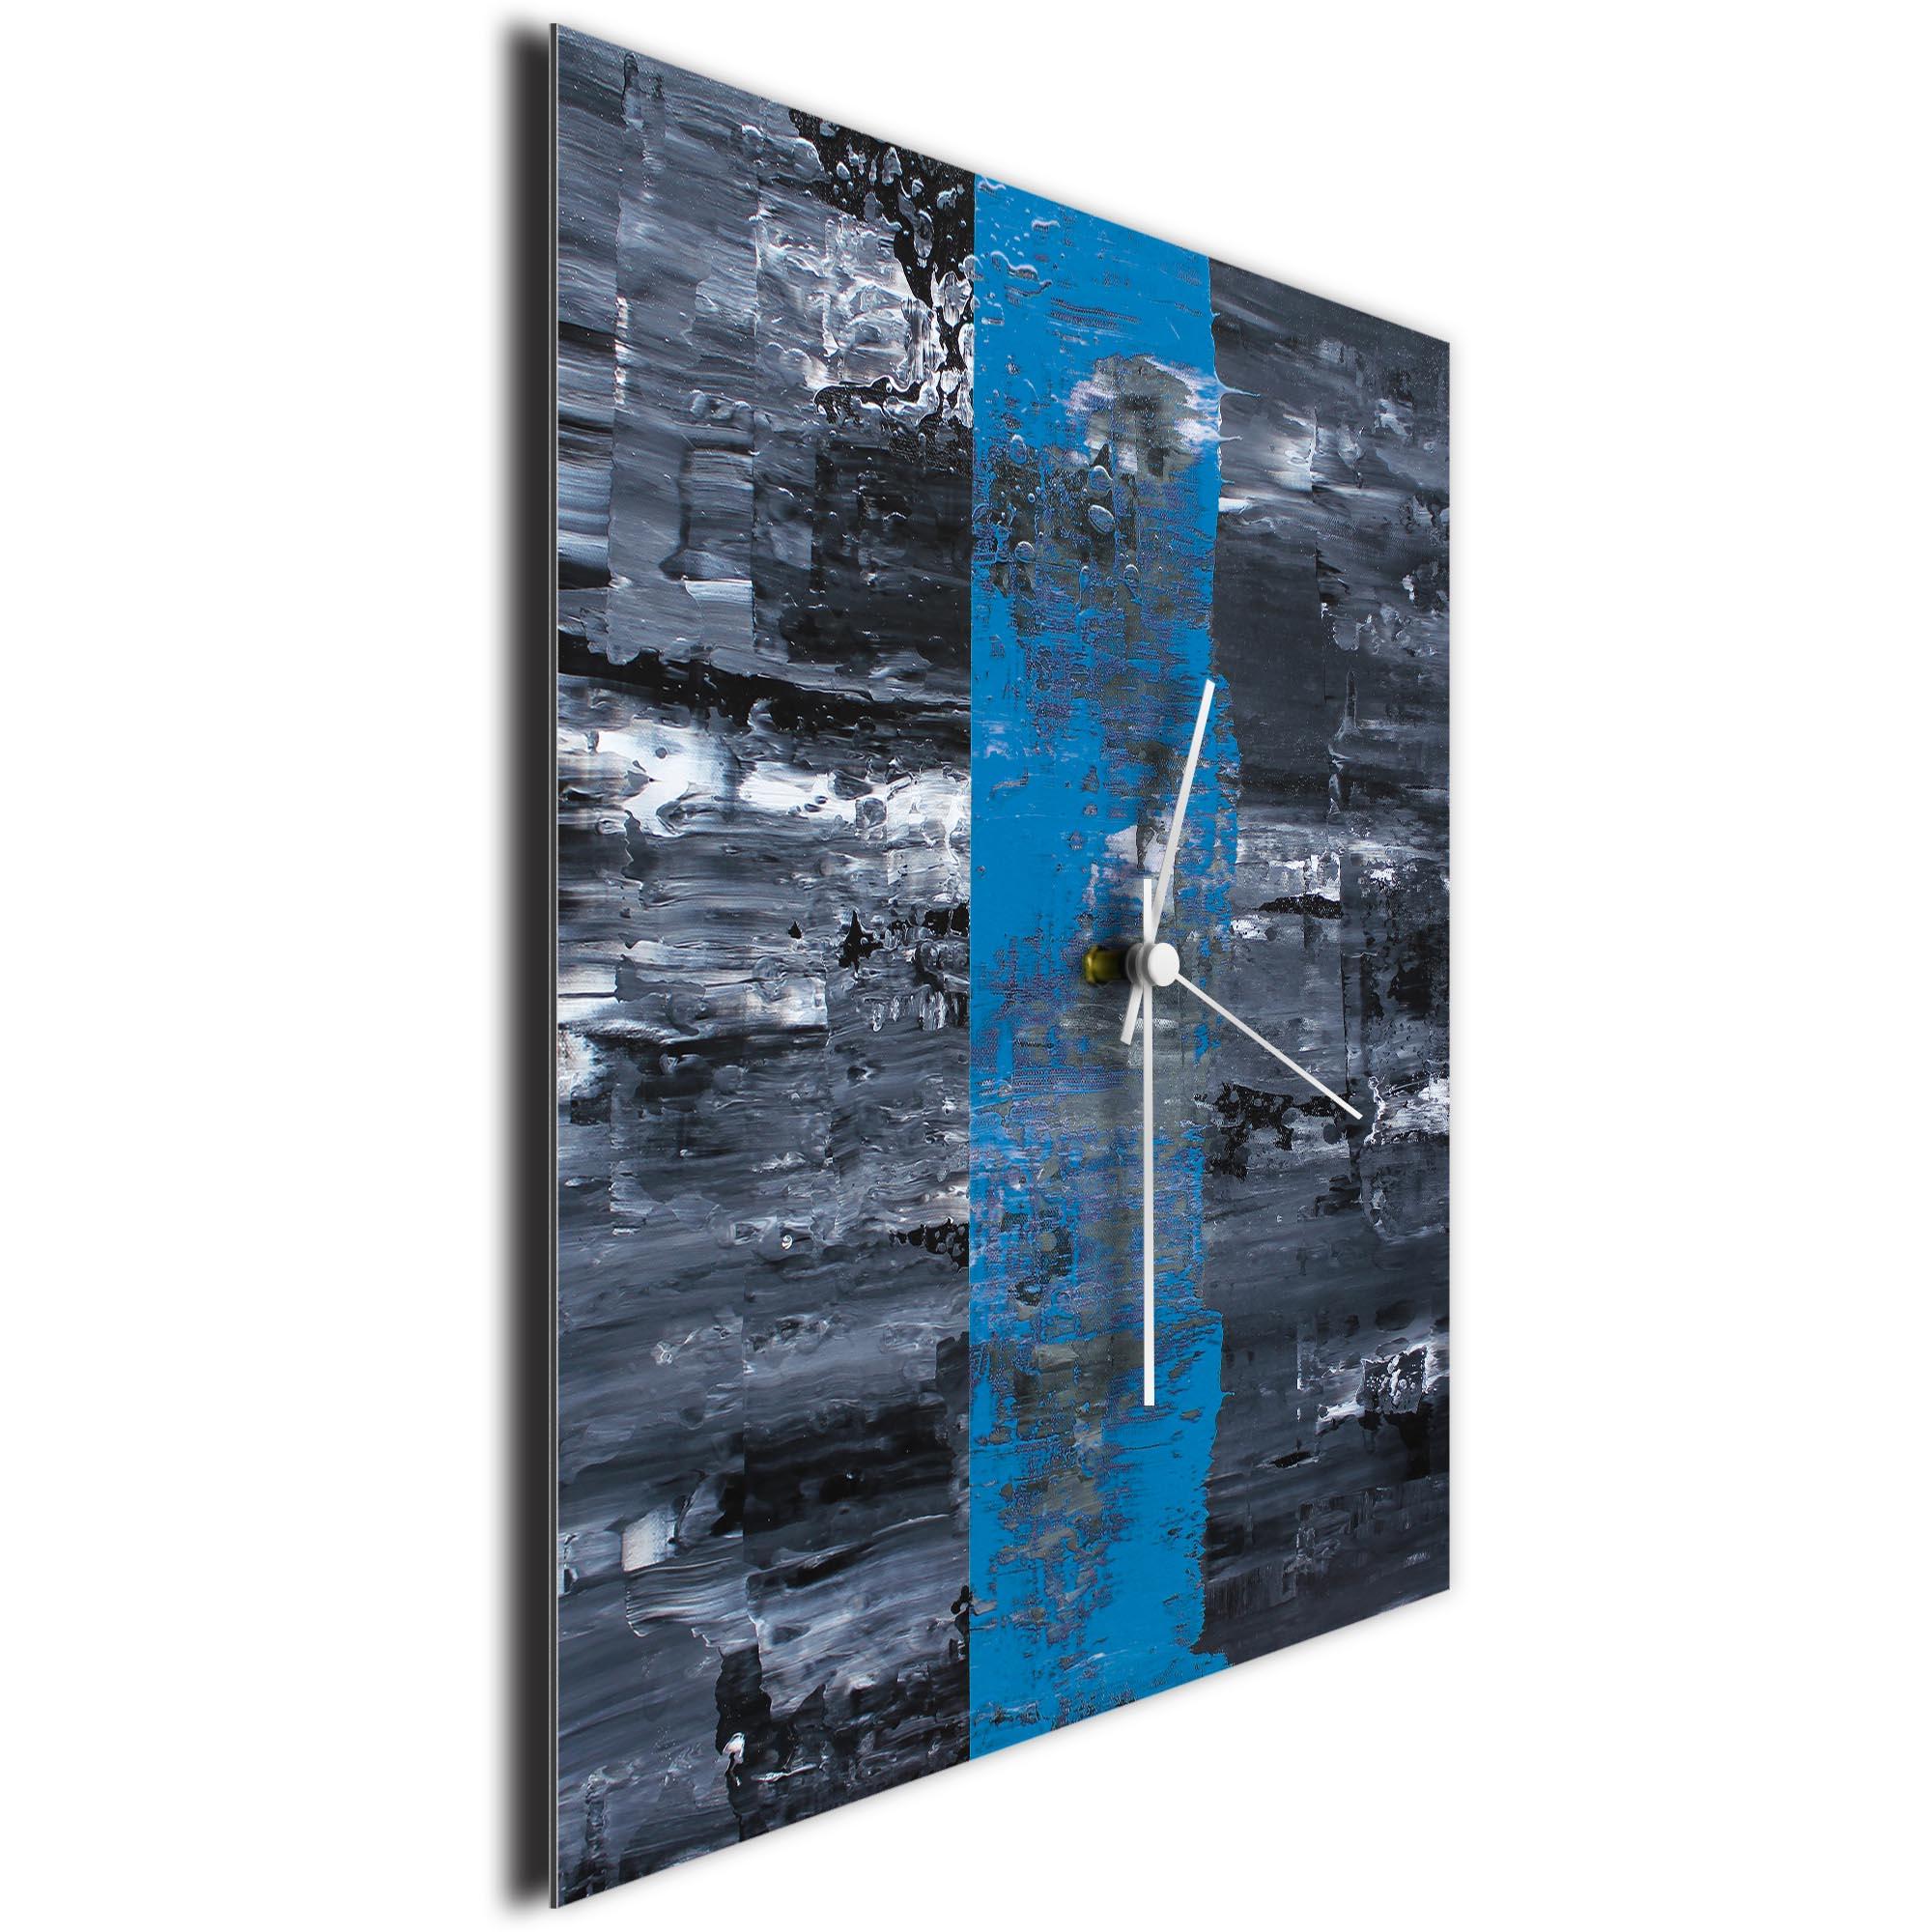 Blue Line Square Clock Large by Mendo Vasilevski - Urban Abstract Home Decor - Image 3